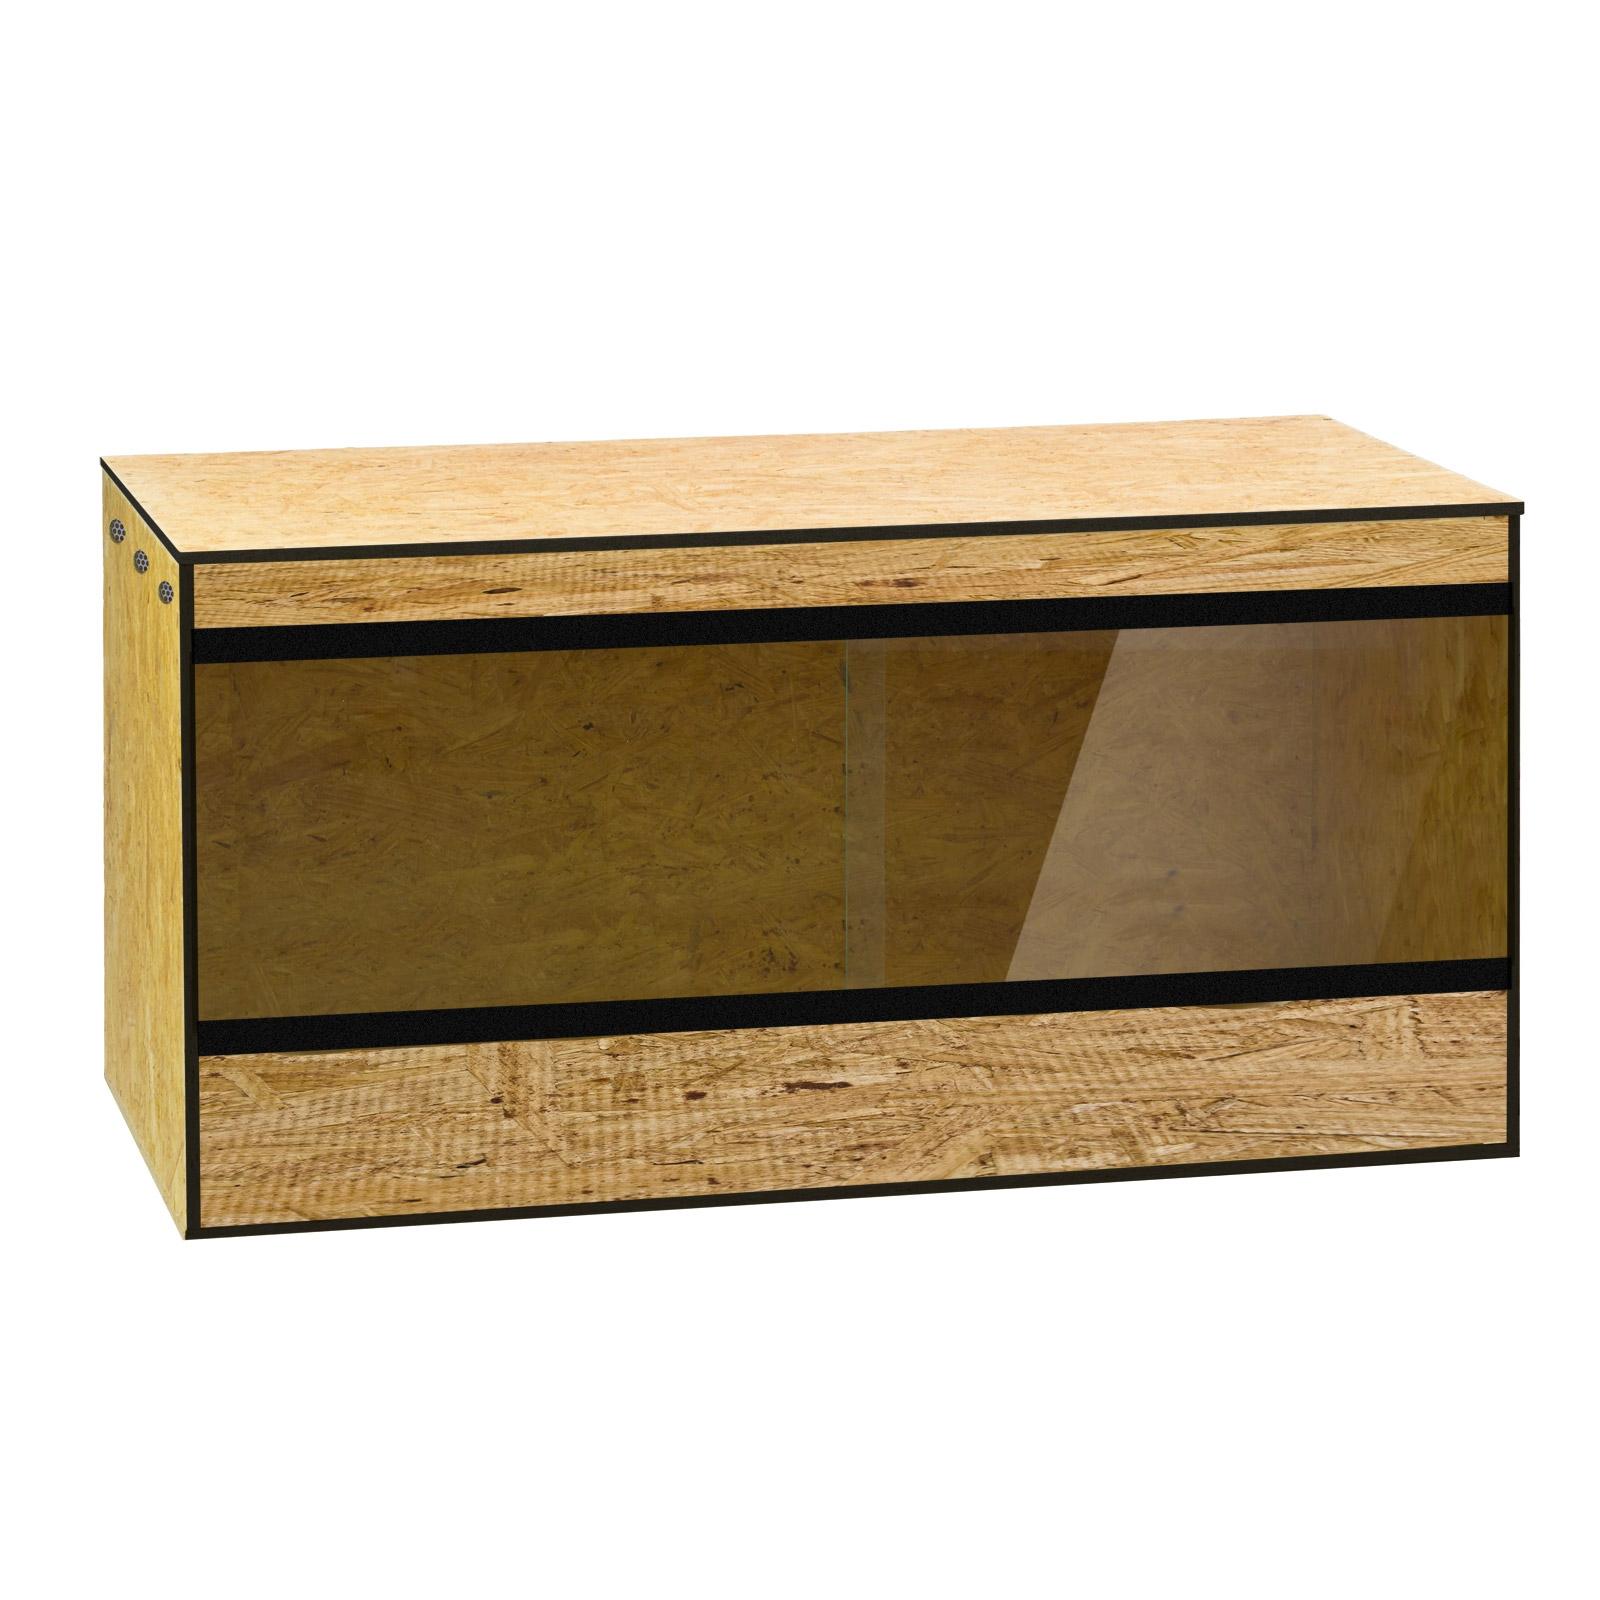 Dema Holz Terrarium Holzkäfig Reptilien Schlangen Holzterrarium 120 x 60 x 60 aus OSB 41223